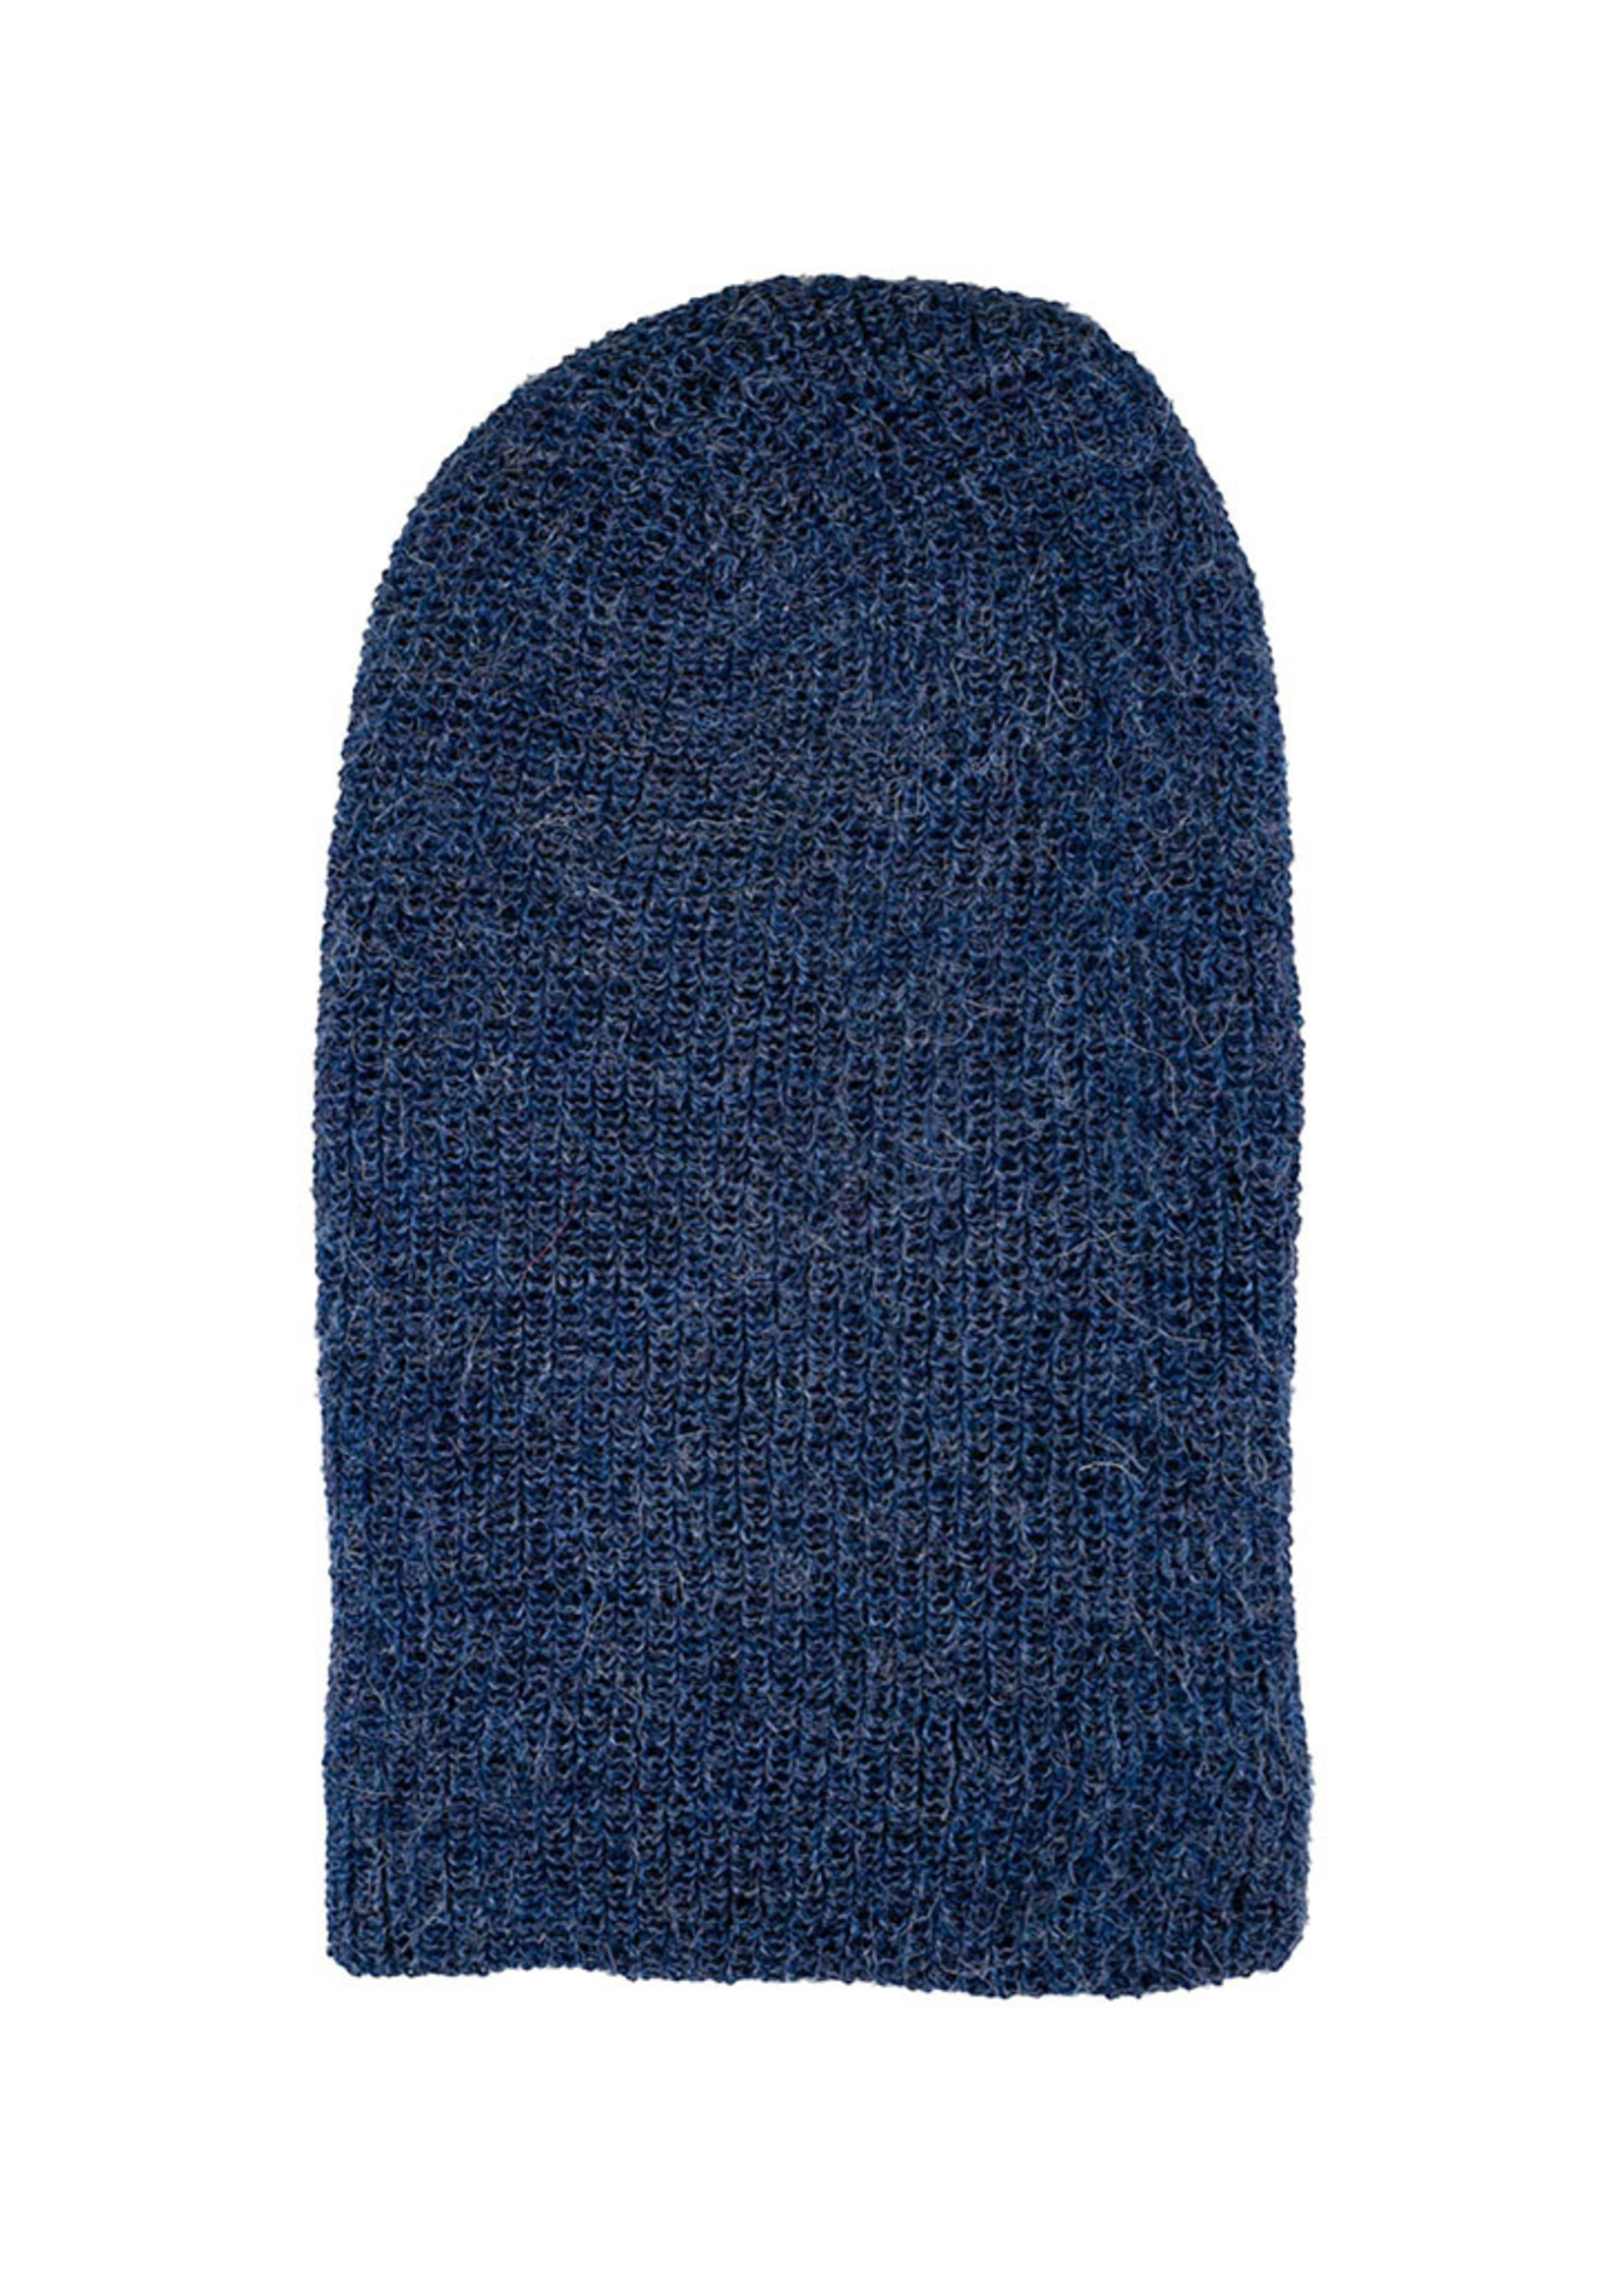 Knit Milkshake Hat